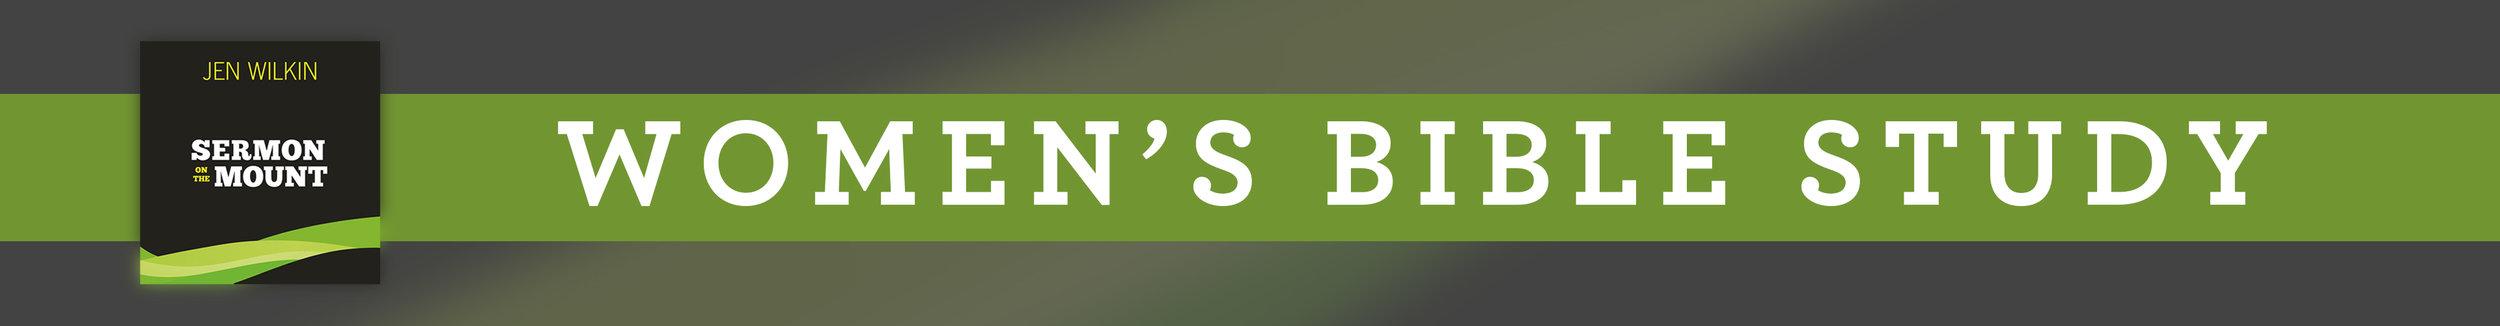 WBSBanner.jpg